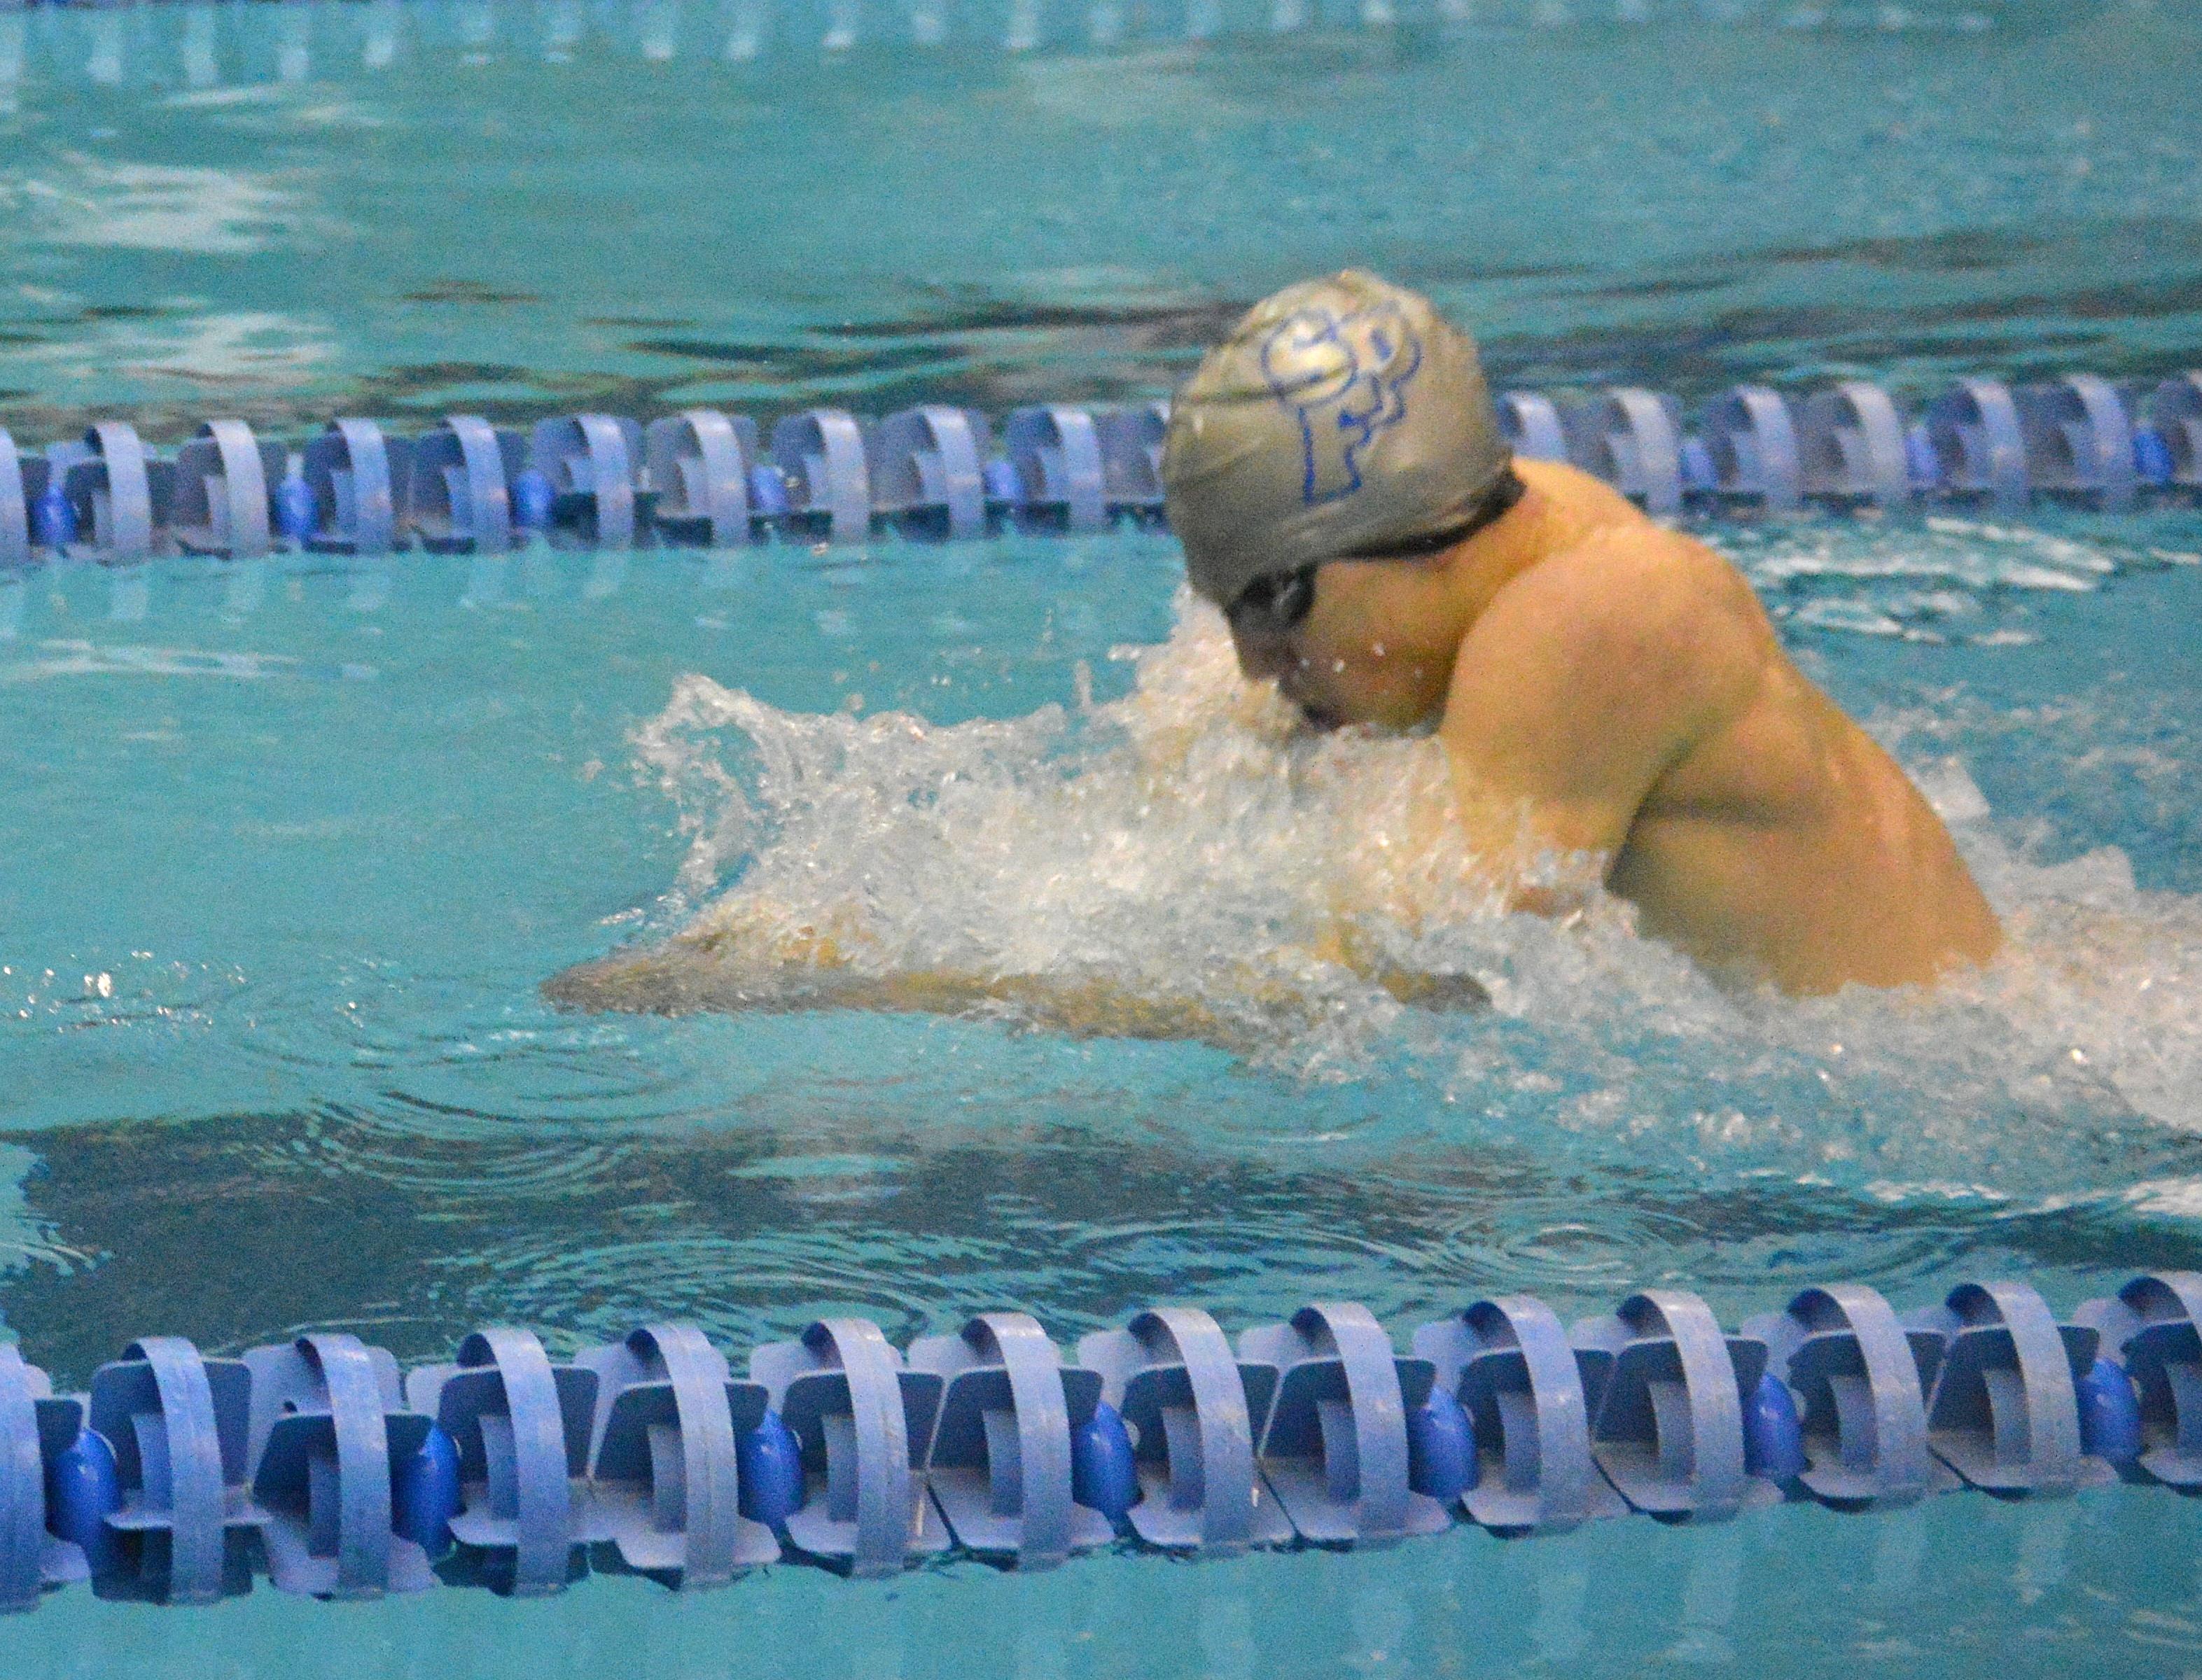 e25b5d6383f2bc16a5e2_WF-SPF_Chris_Bondarowicz_swims_in_100_Breast.JPG